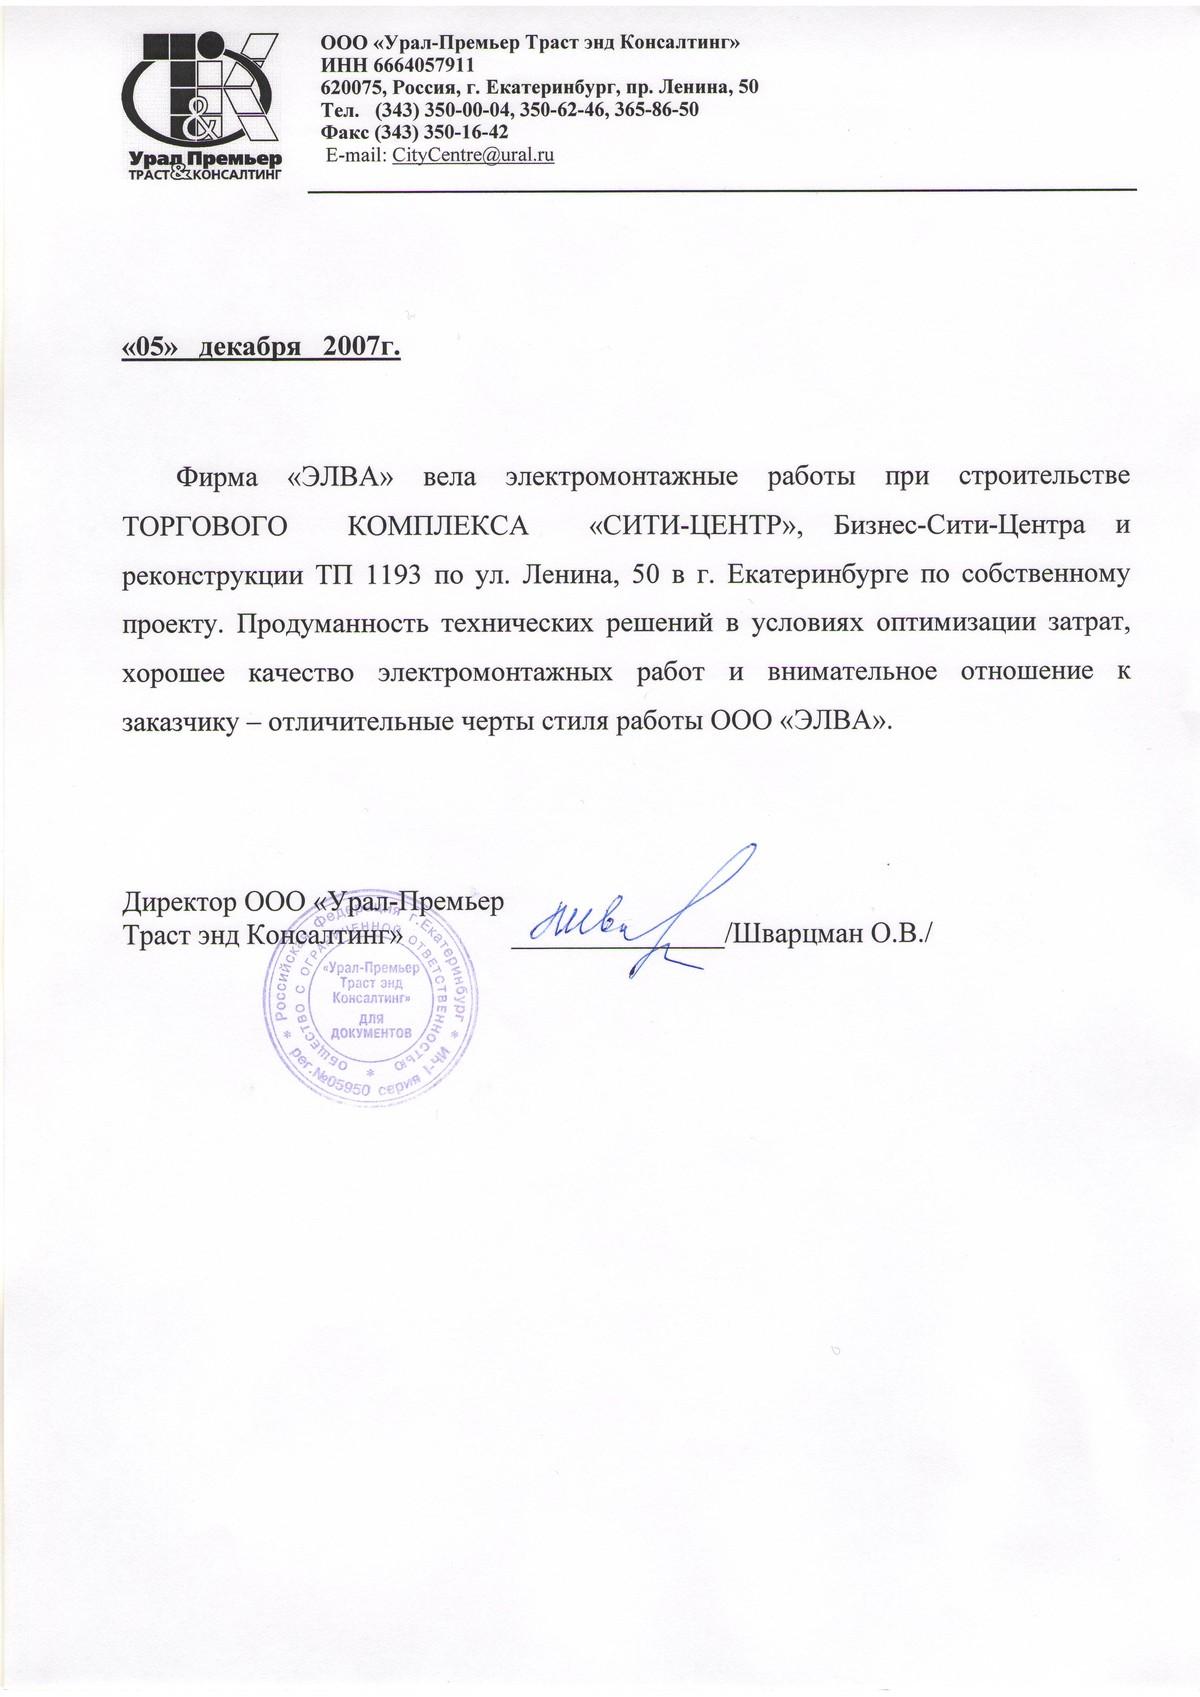 ООО «Урал-Премьер Траст энд Консалтинг»